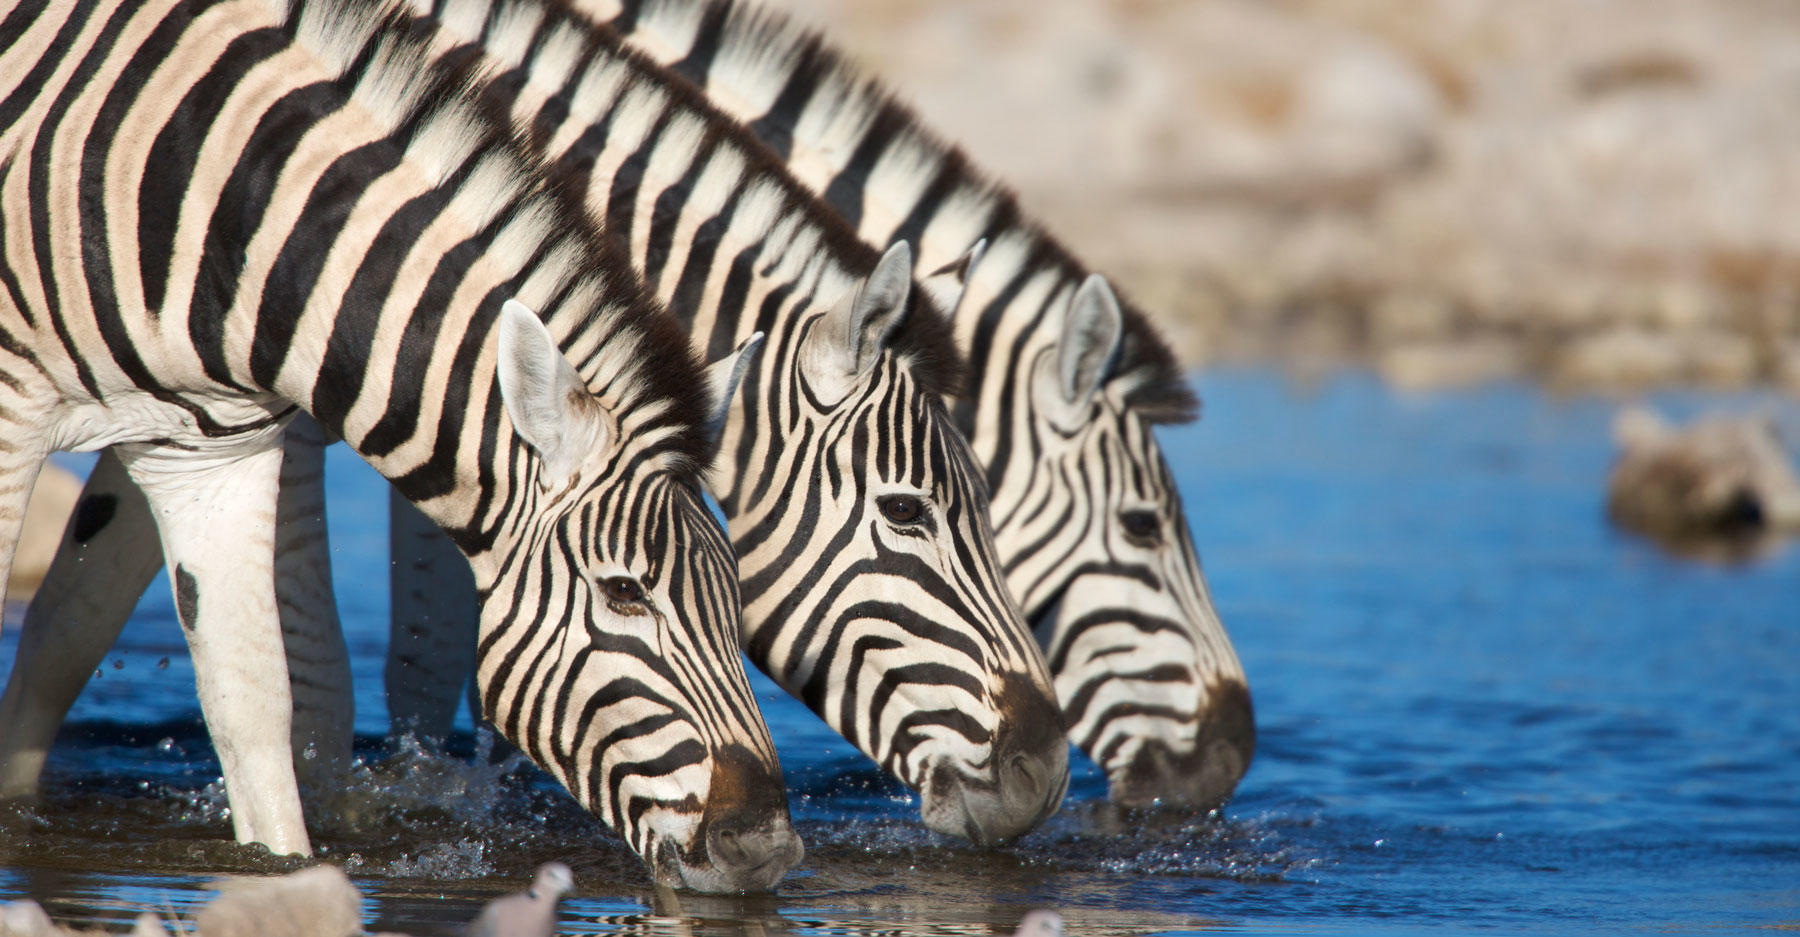 The Plains Zebra (Equus quagga, formerly Equus burchelli), also known as the Common Zebra or the Burchell's Zebra.